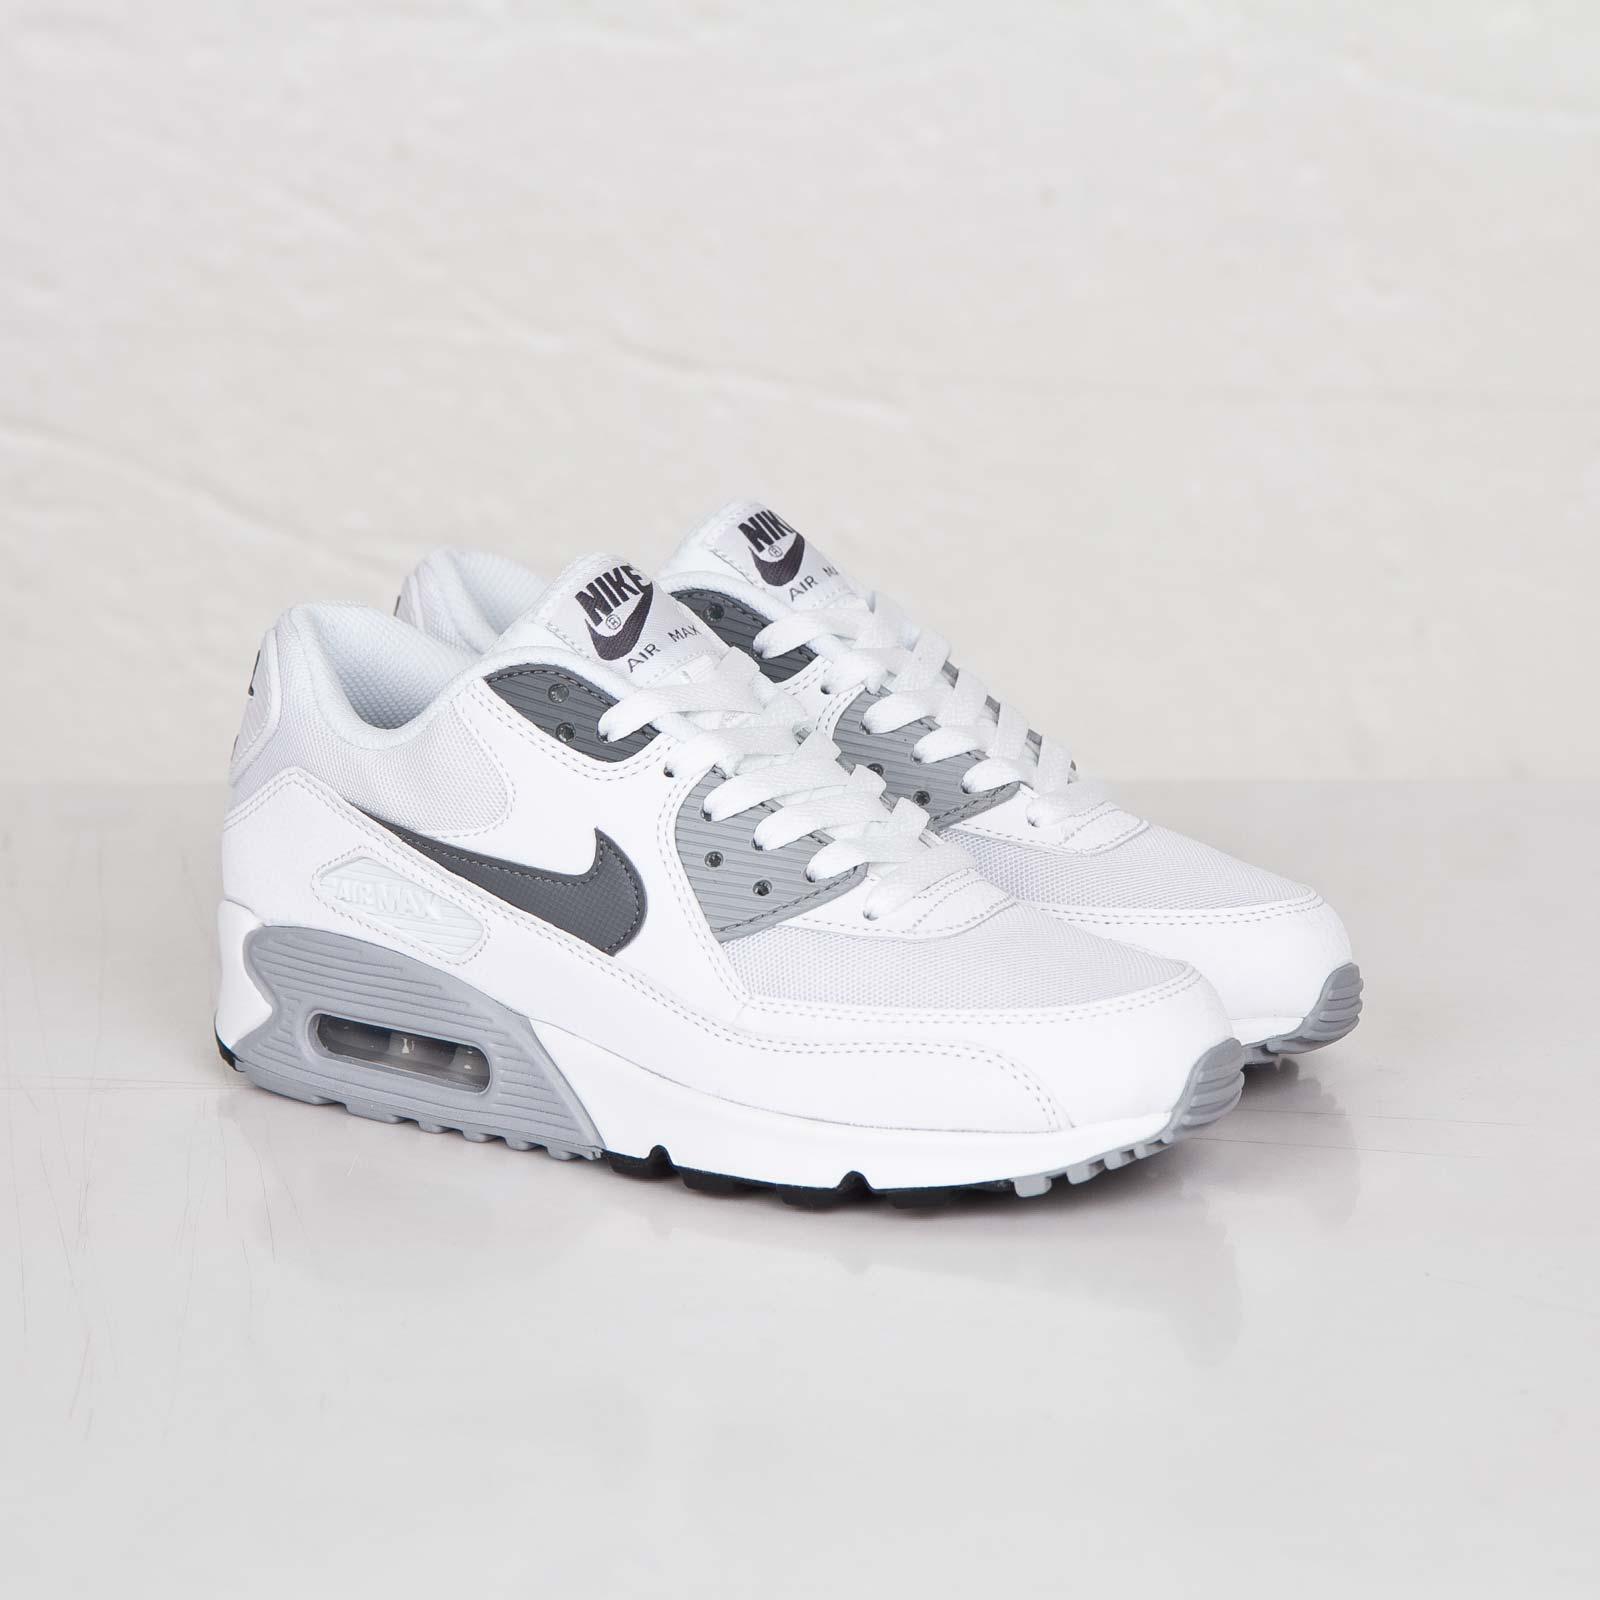 Nike Wmns Air Max 90 Essential 616730 108 Sneakersnstuff